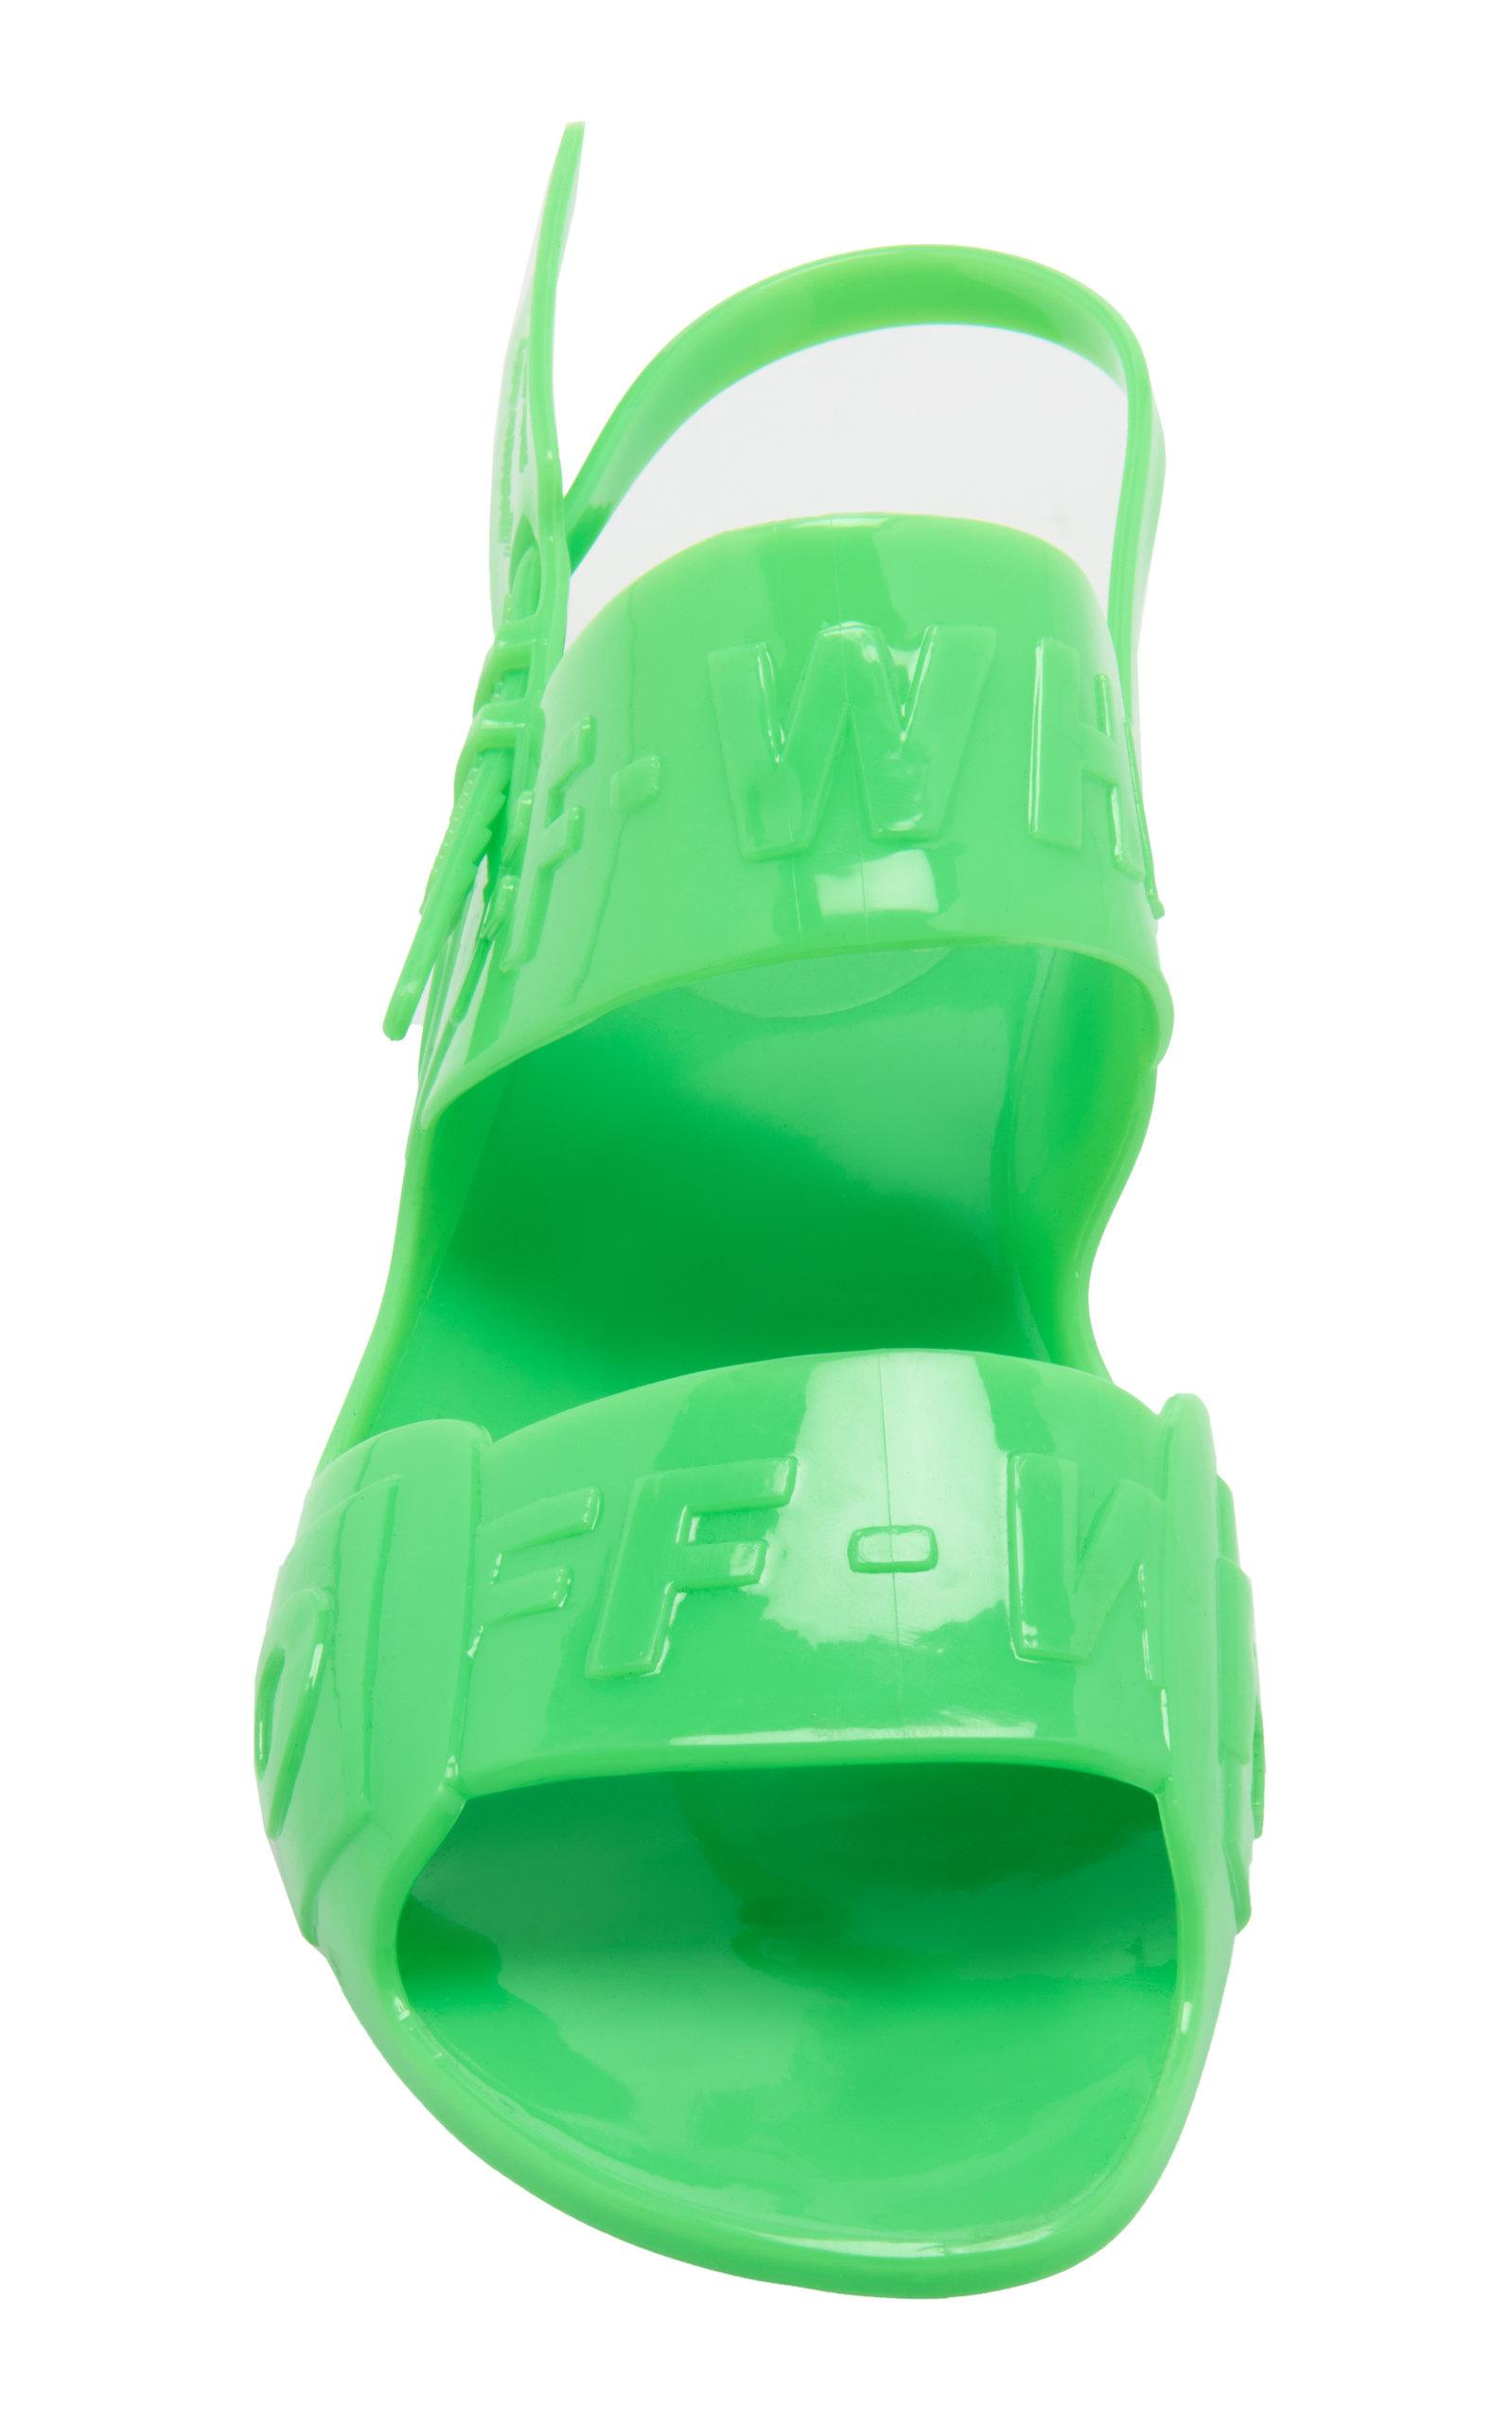 756eb589c7ce Off-White c/o Virgil Abloh Zip-tie Vinyl Sandals in Green - Lyst